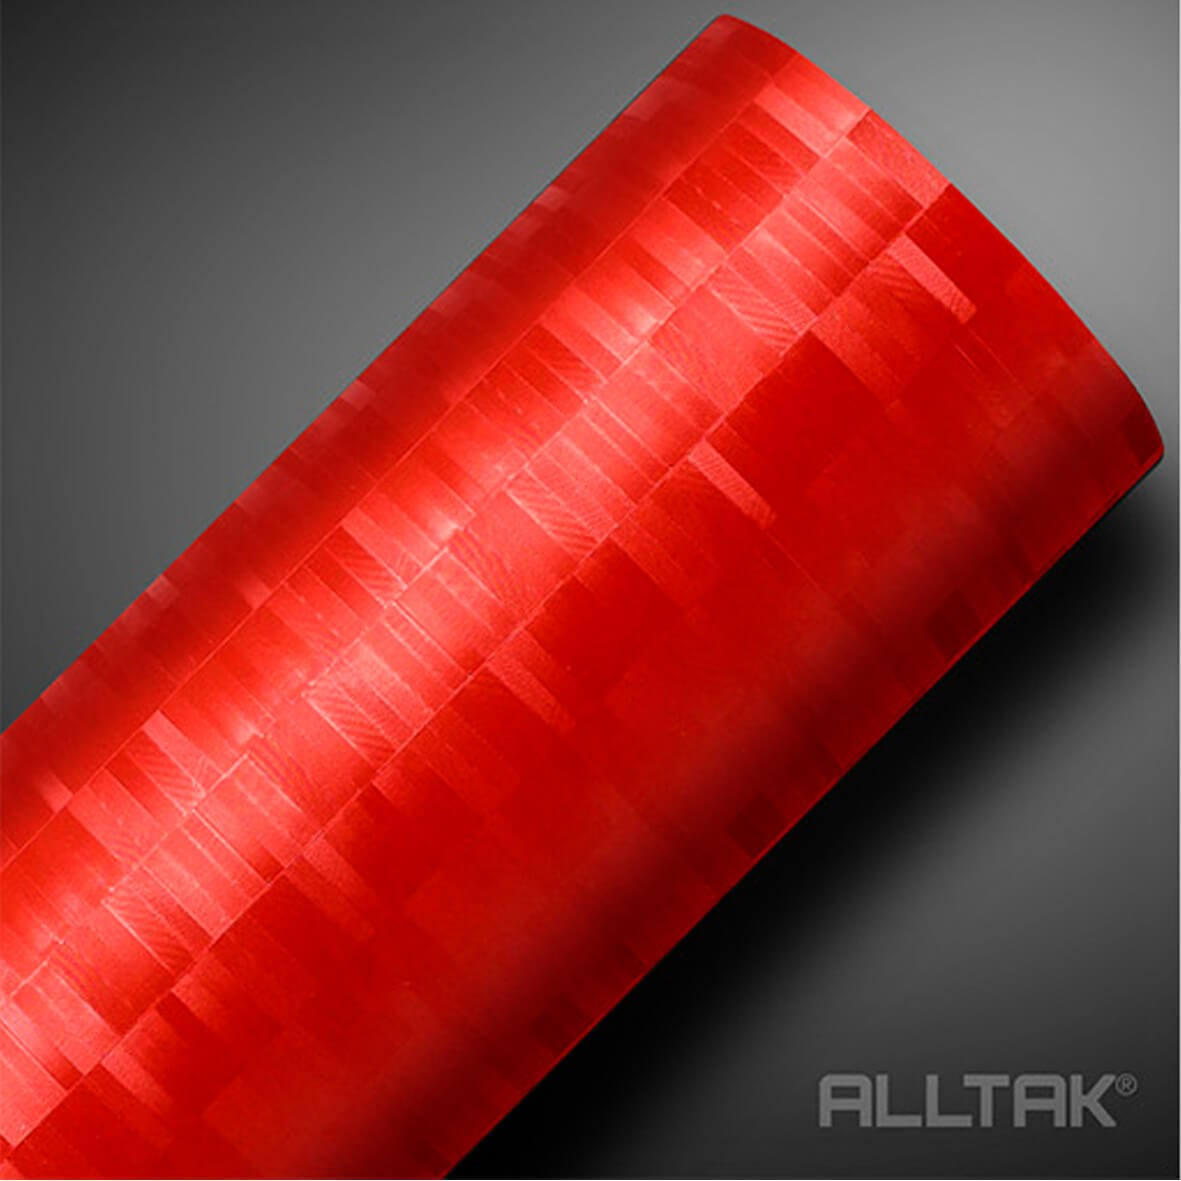 Adesivo Alltak Pixel Vermelho 1,38 x 1,00m